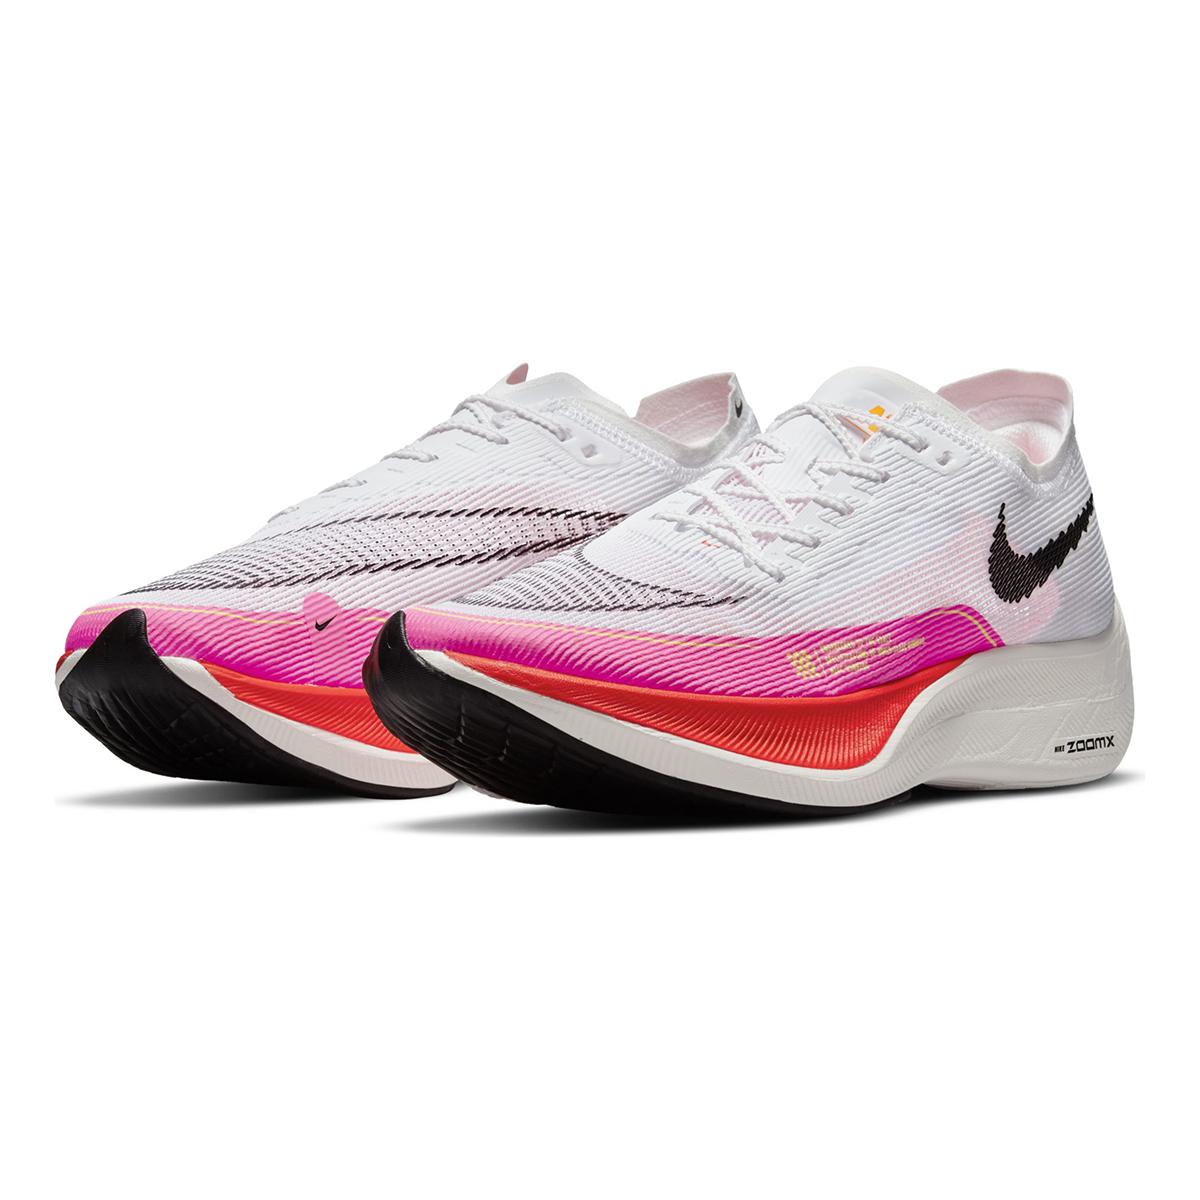 Men's Nike ZoomX Vaporfly Next% 2 Running Shoe - Color: Rawdacious - Size: 6 - Width: Regular, Rawdacious, large, image 4